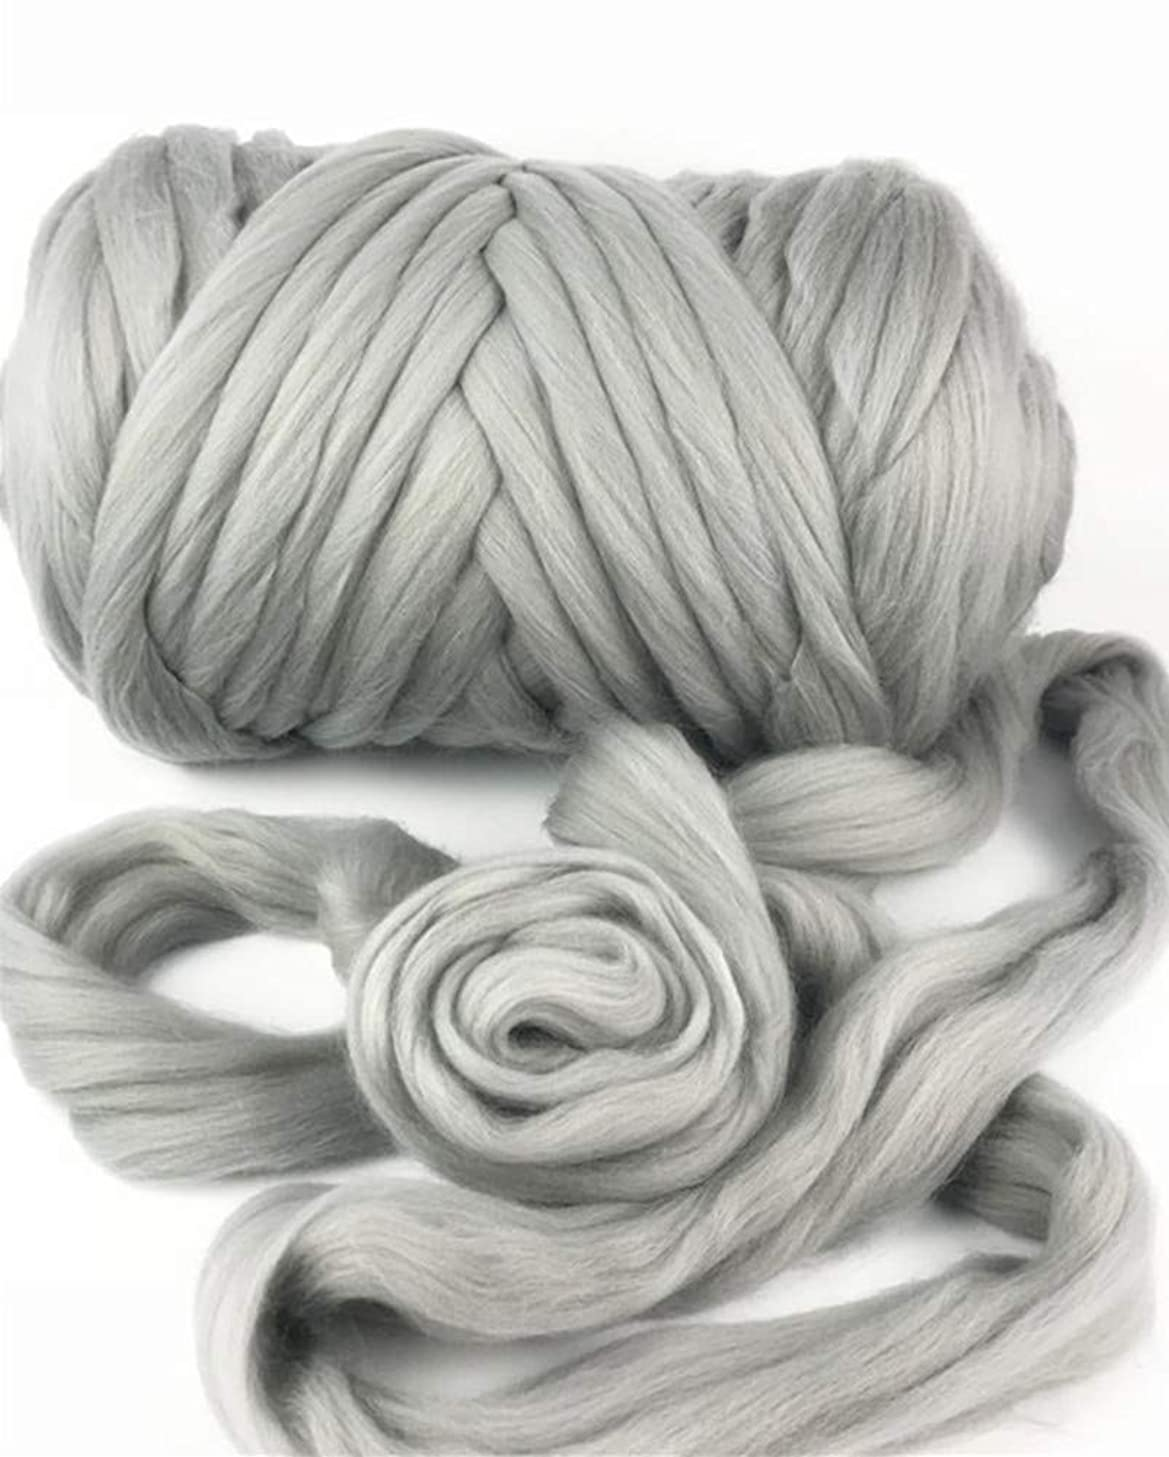 HomeModa Studio Giant Bulky Big Yarn Extreme Arm Knitting Kit Chunky Knit Blanket Very Thick Gigantic Yarn Massive Knitted Loop (Grey, 2.2lbs/57yard/1kg)